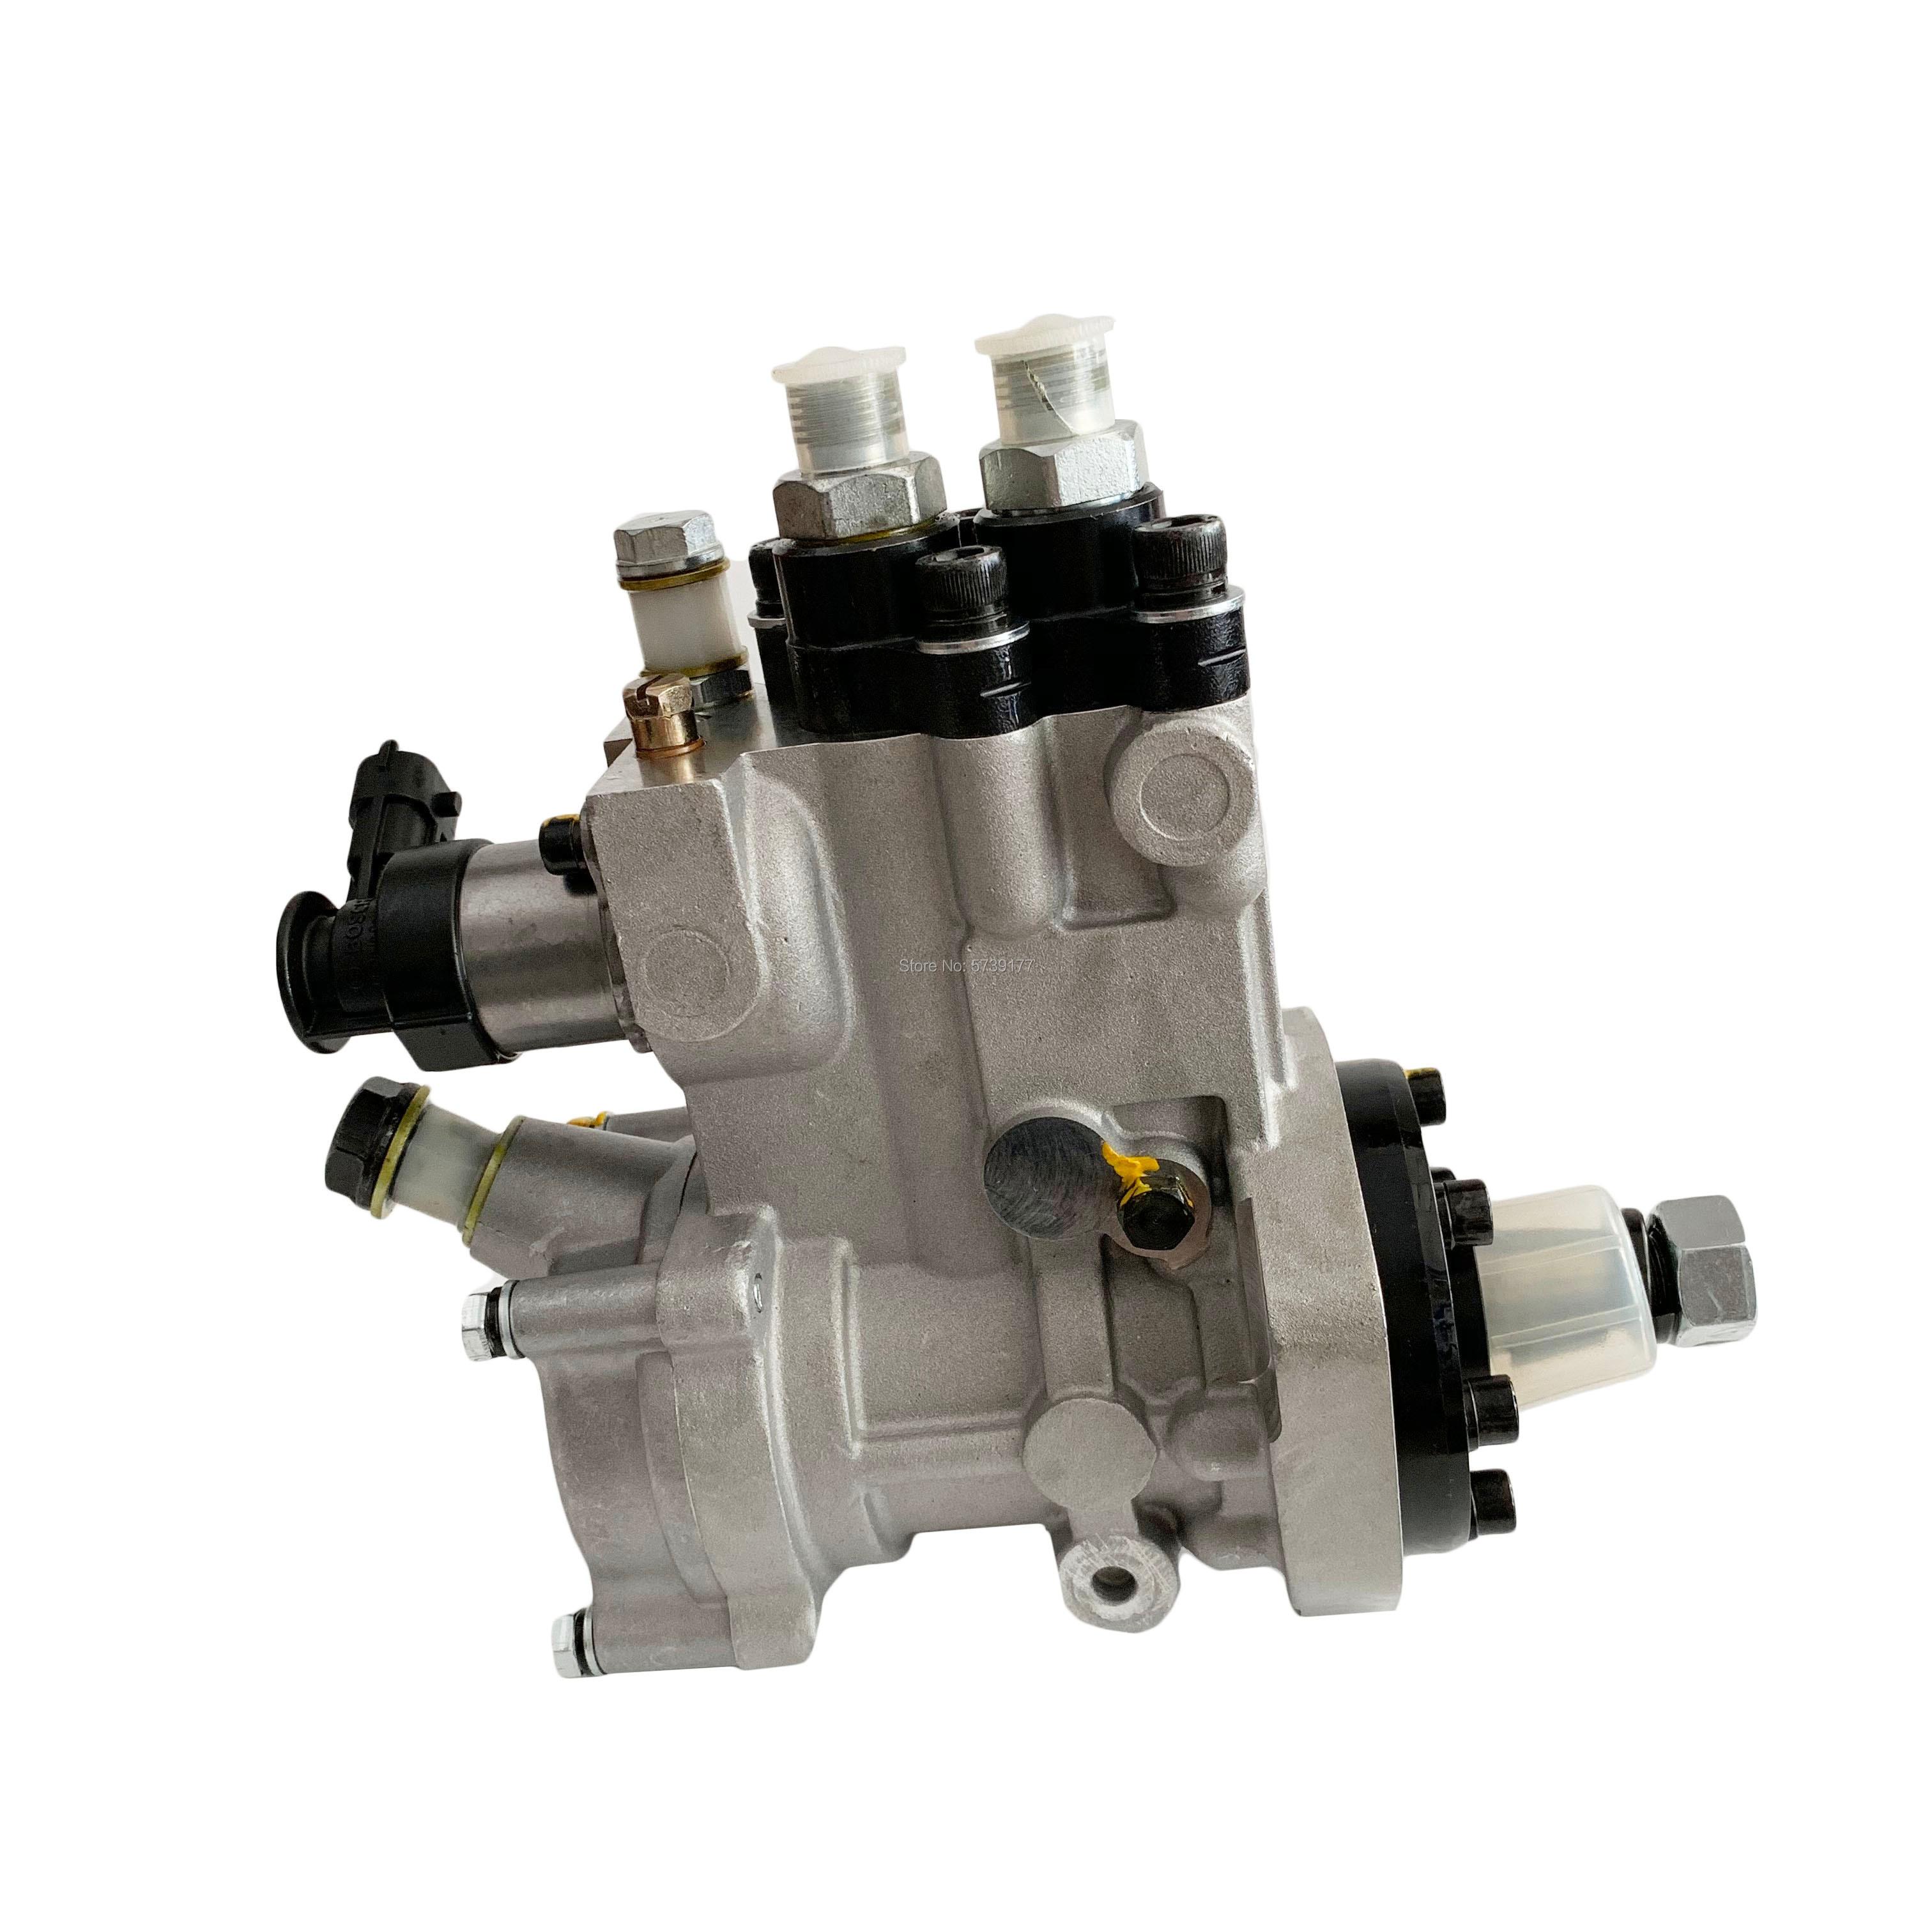 Professional High pressure injection common rail pump CB18 0445025027